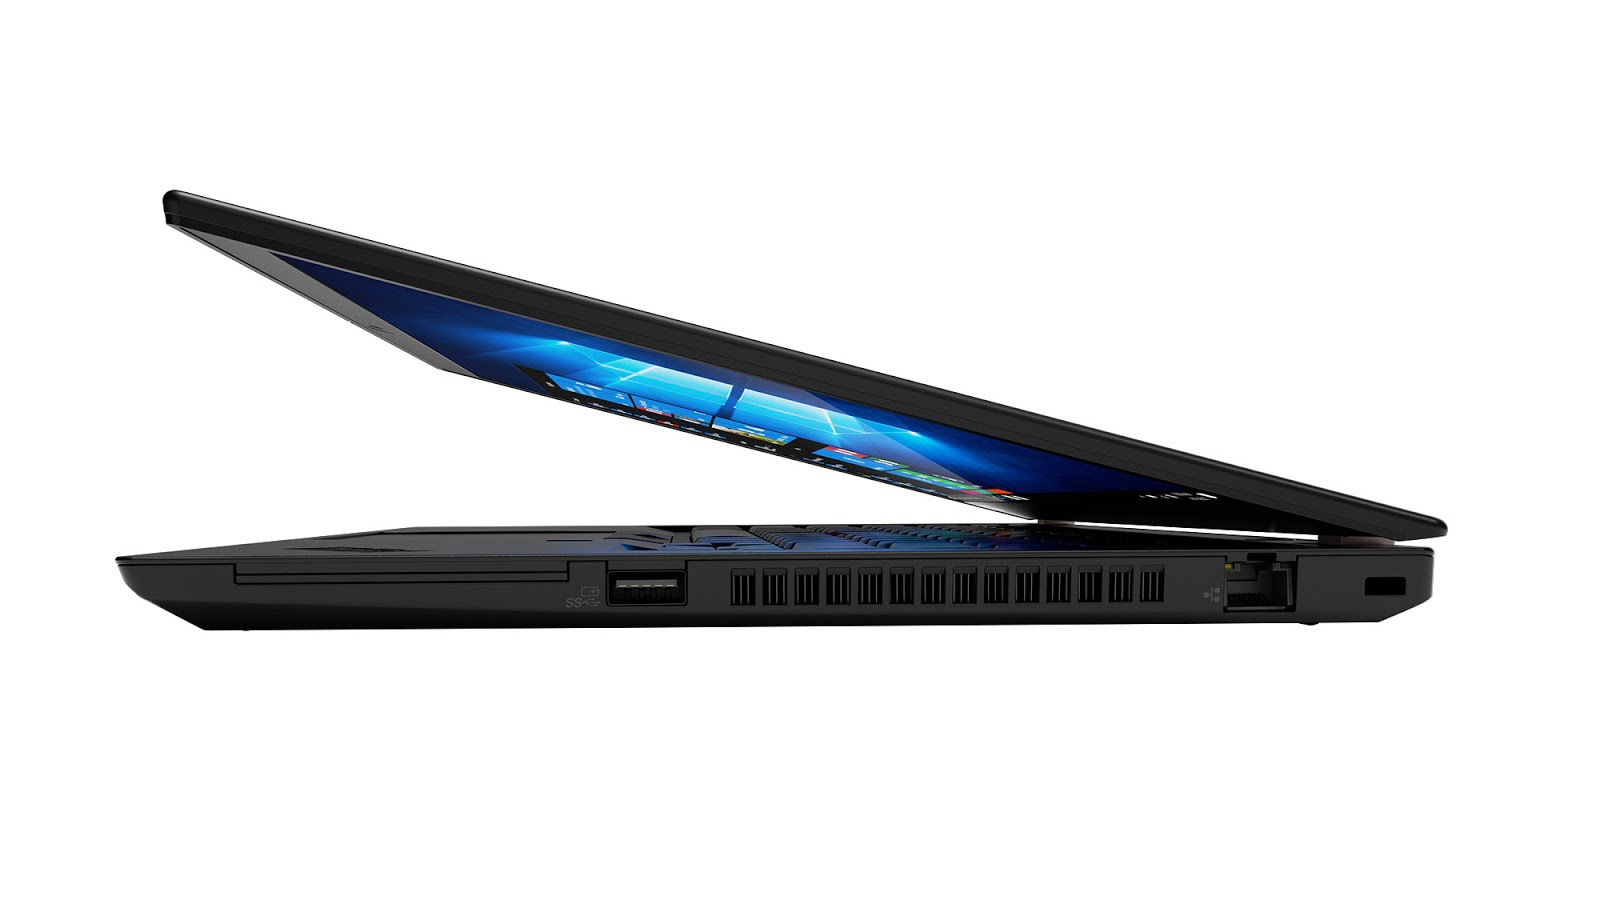 Фото 1. Ноутбук Lenovo ThinkPad T14 Gen 1 Black (20S00013RT)